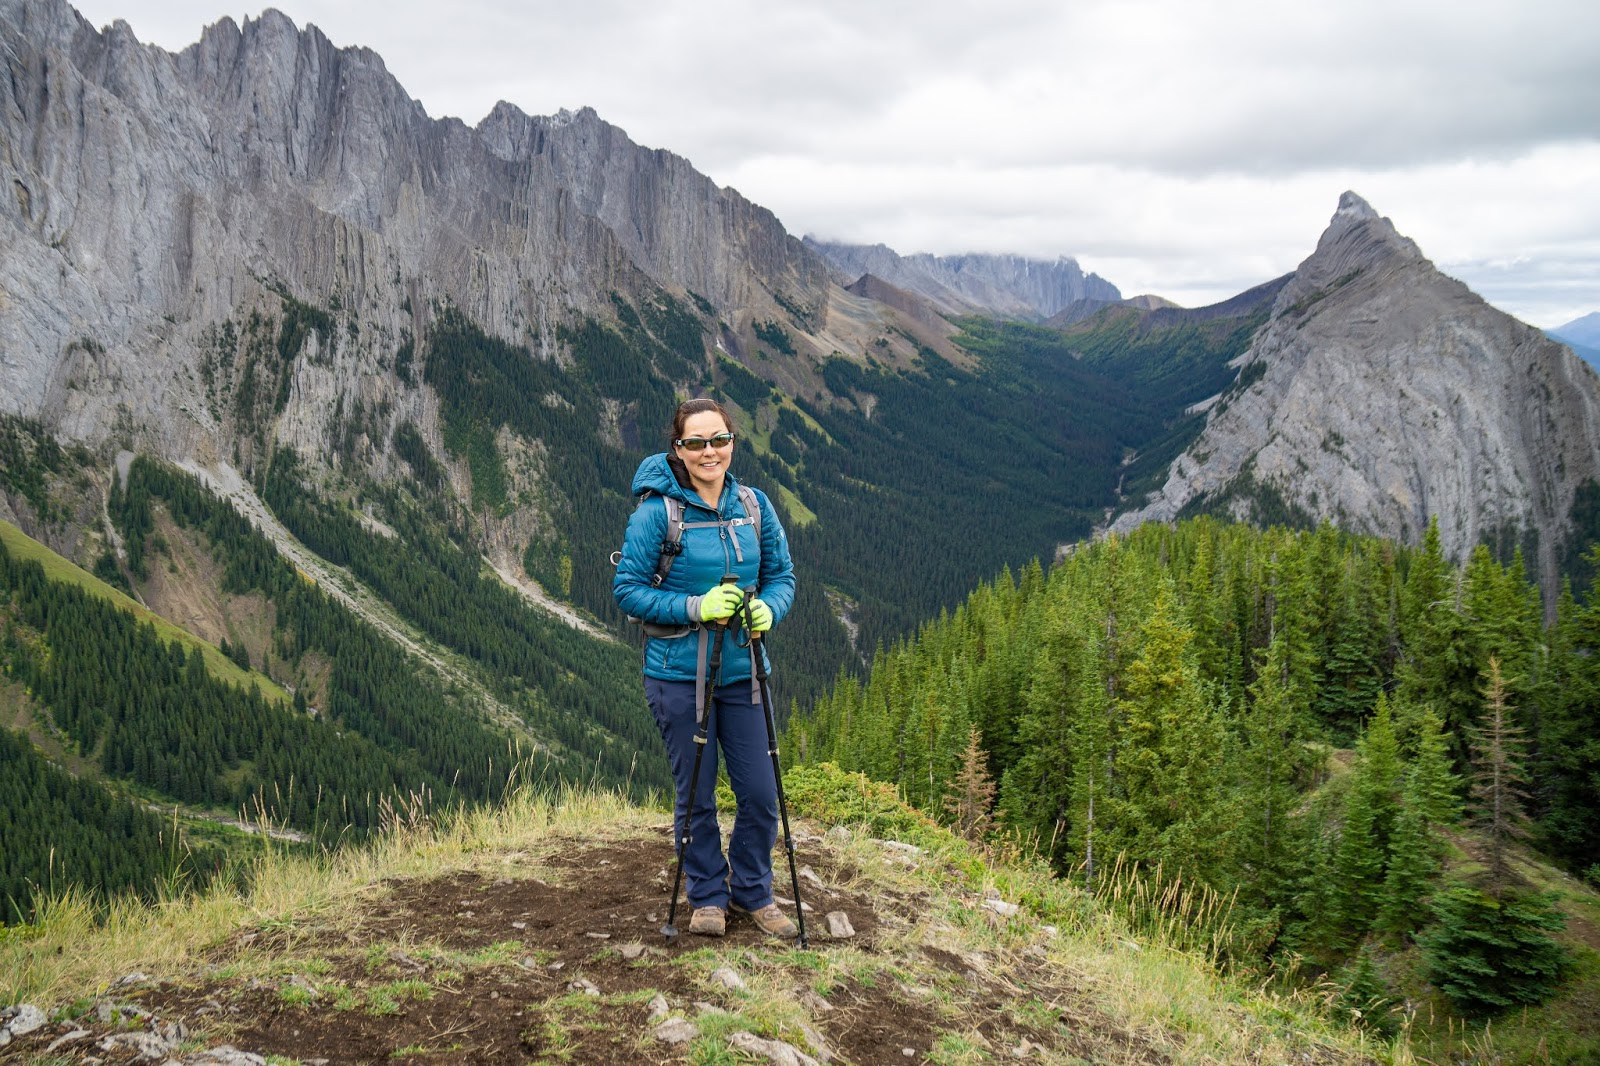 A fantastic viewpoint on King Creek Ridge